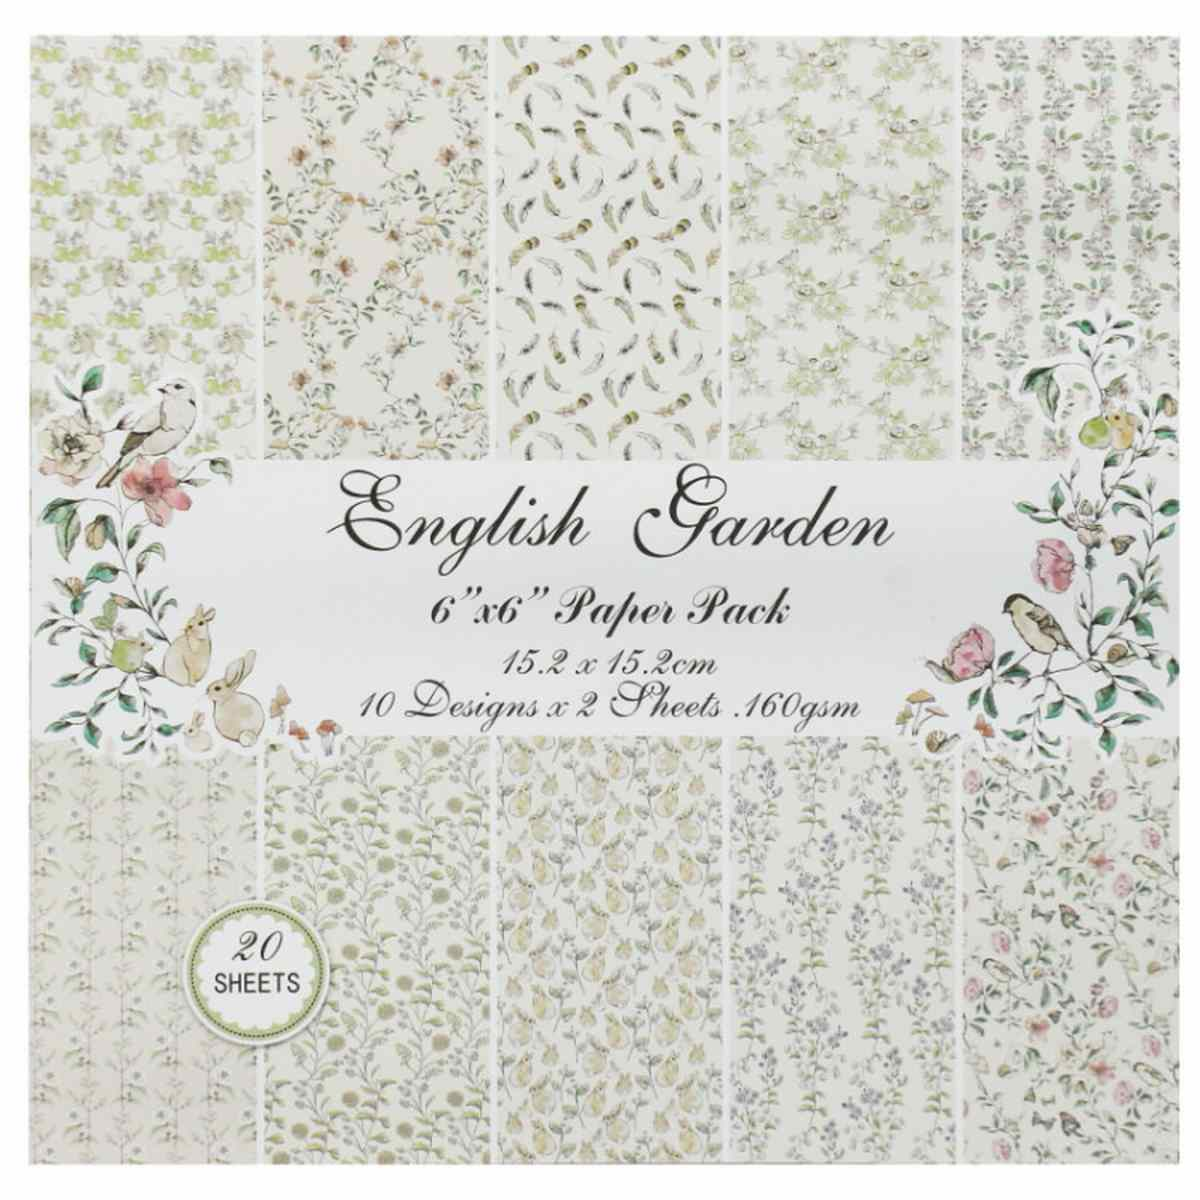 English Garden 6x6 Inch Printed Paper